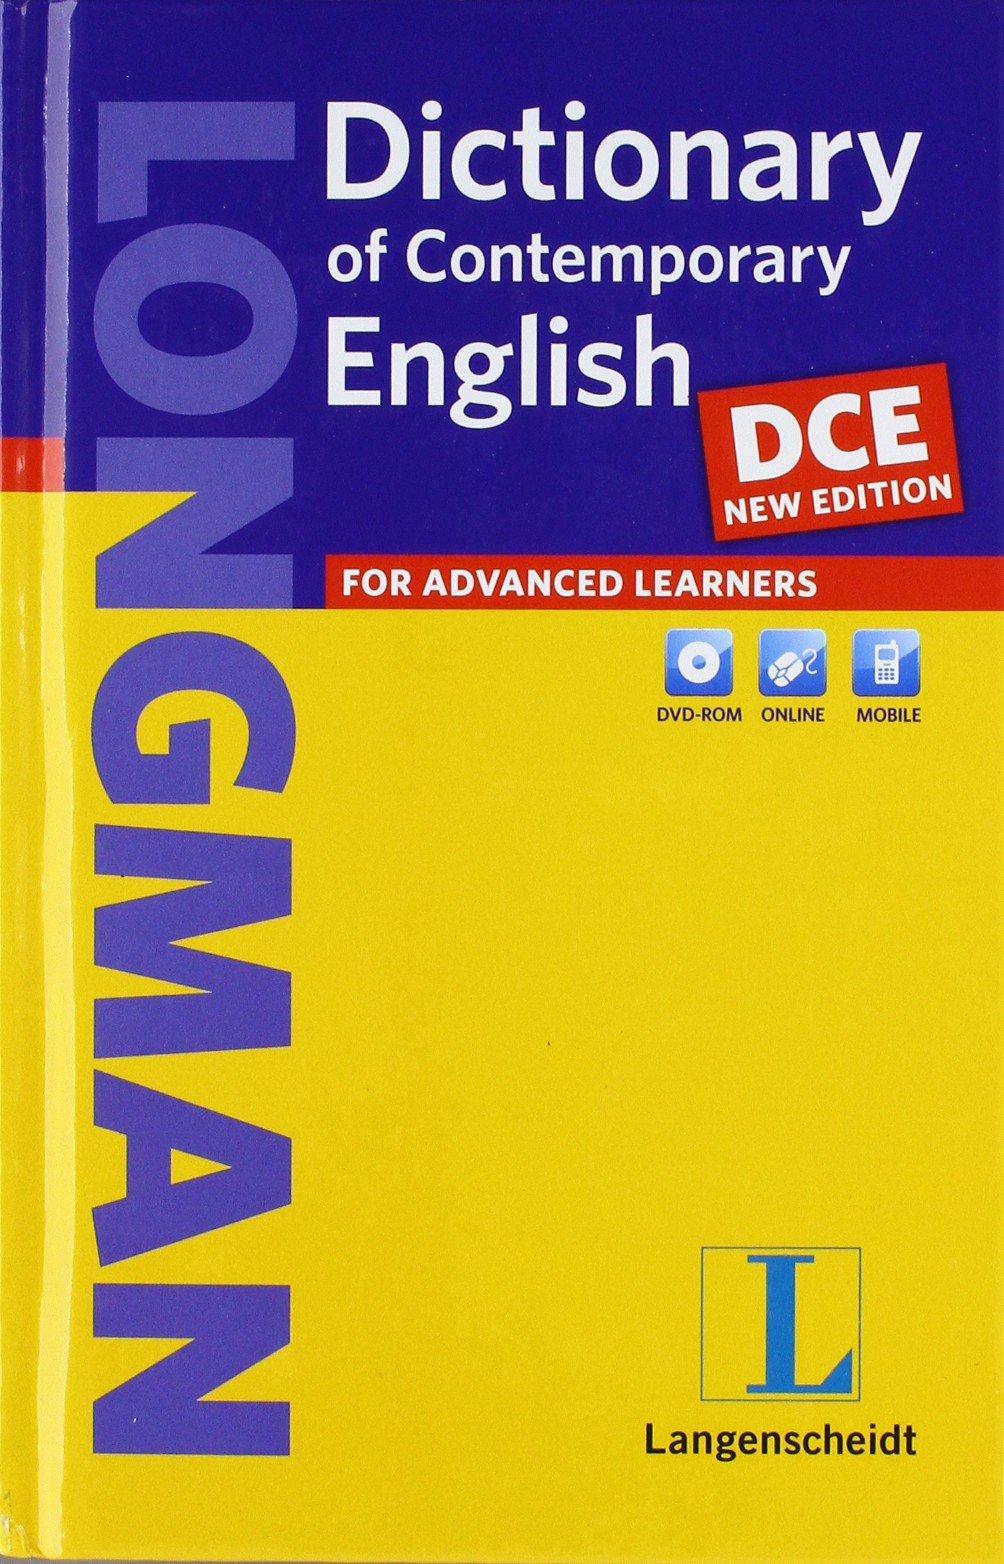 73cfc7f8d40d53 Longman Dictionary of Contemporary English DCE - New Edition - Buch  Hardcover mit DVD-ROM Einsprachige Wörterbücher  Amazon.de  Bücher